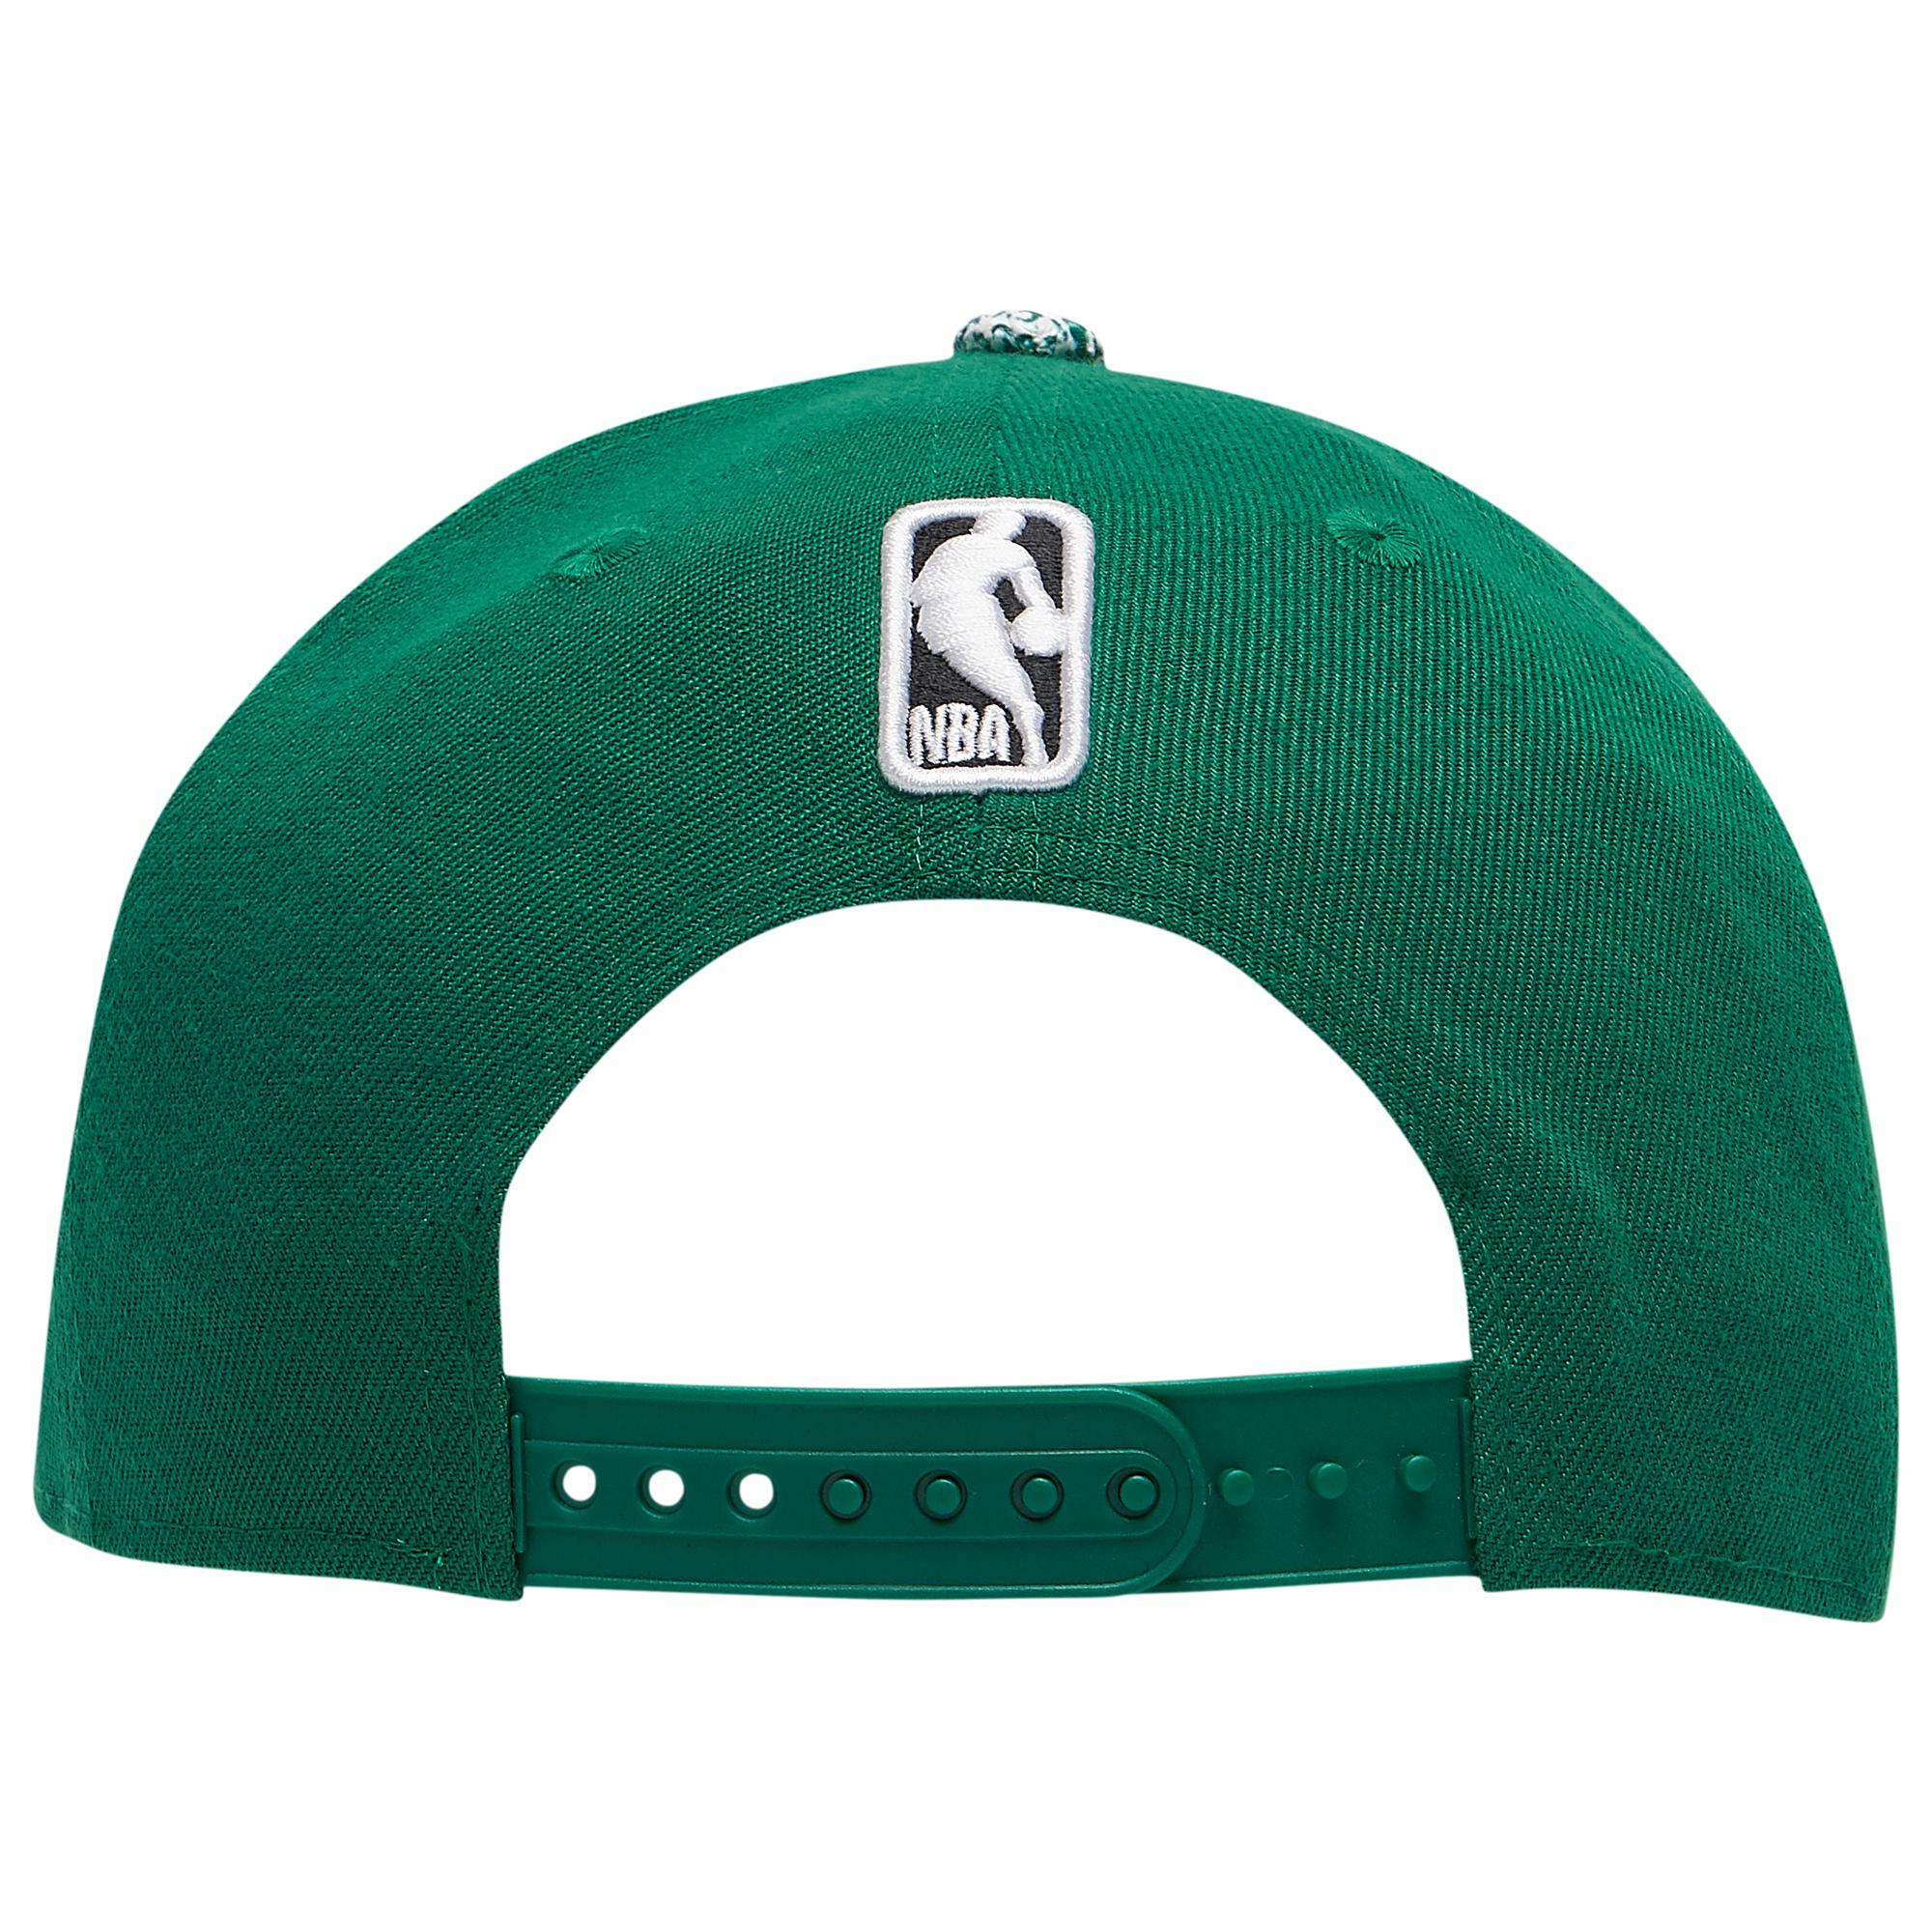 size 40 2eb2b 9089e ... Boston Celtics Nba 9fifty Visor Craze Snapback Cap for Men - Lyst. View  fullscreen